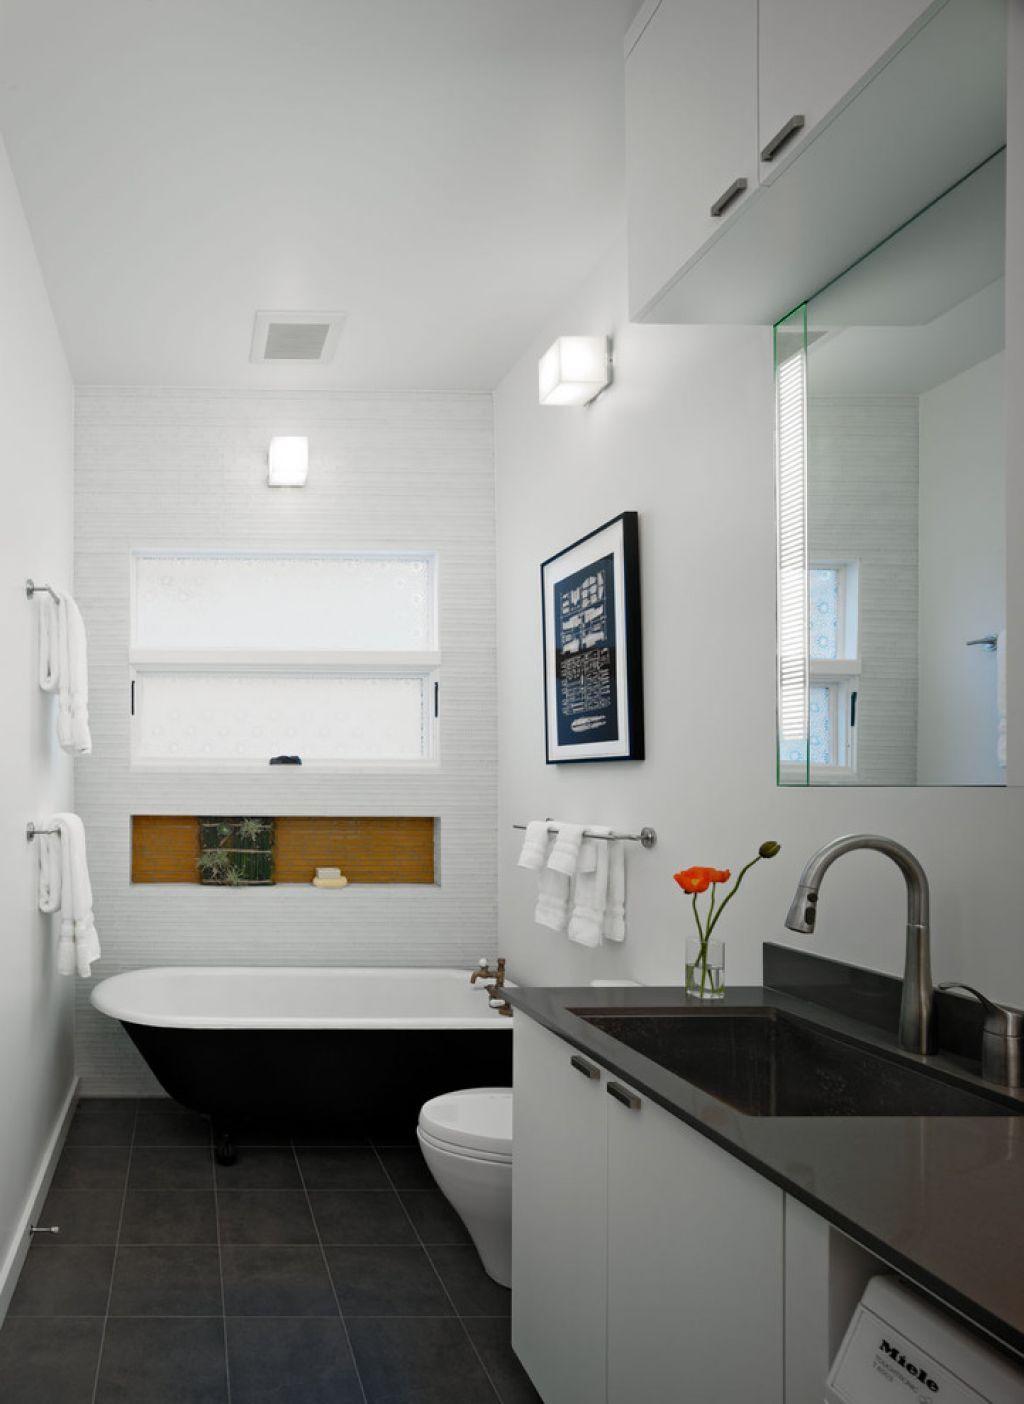 Small Narrow Bathroom With Black Clawfoot Tub | Ideas for the House ...